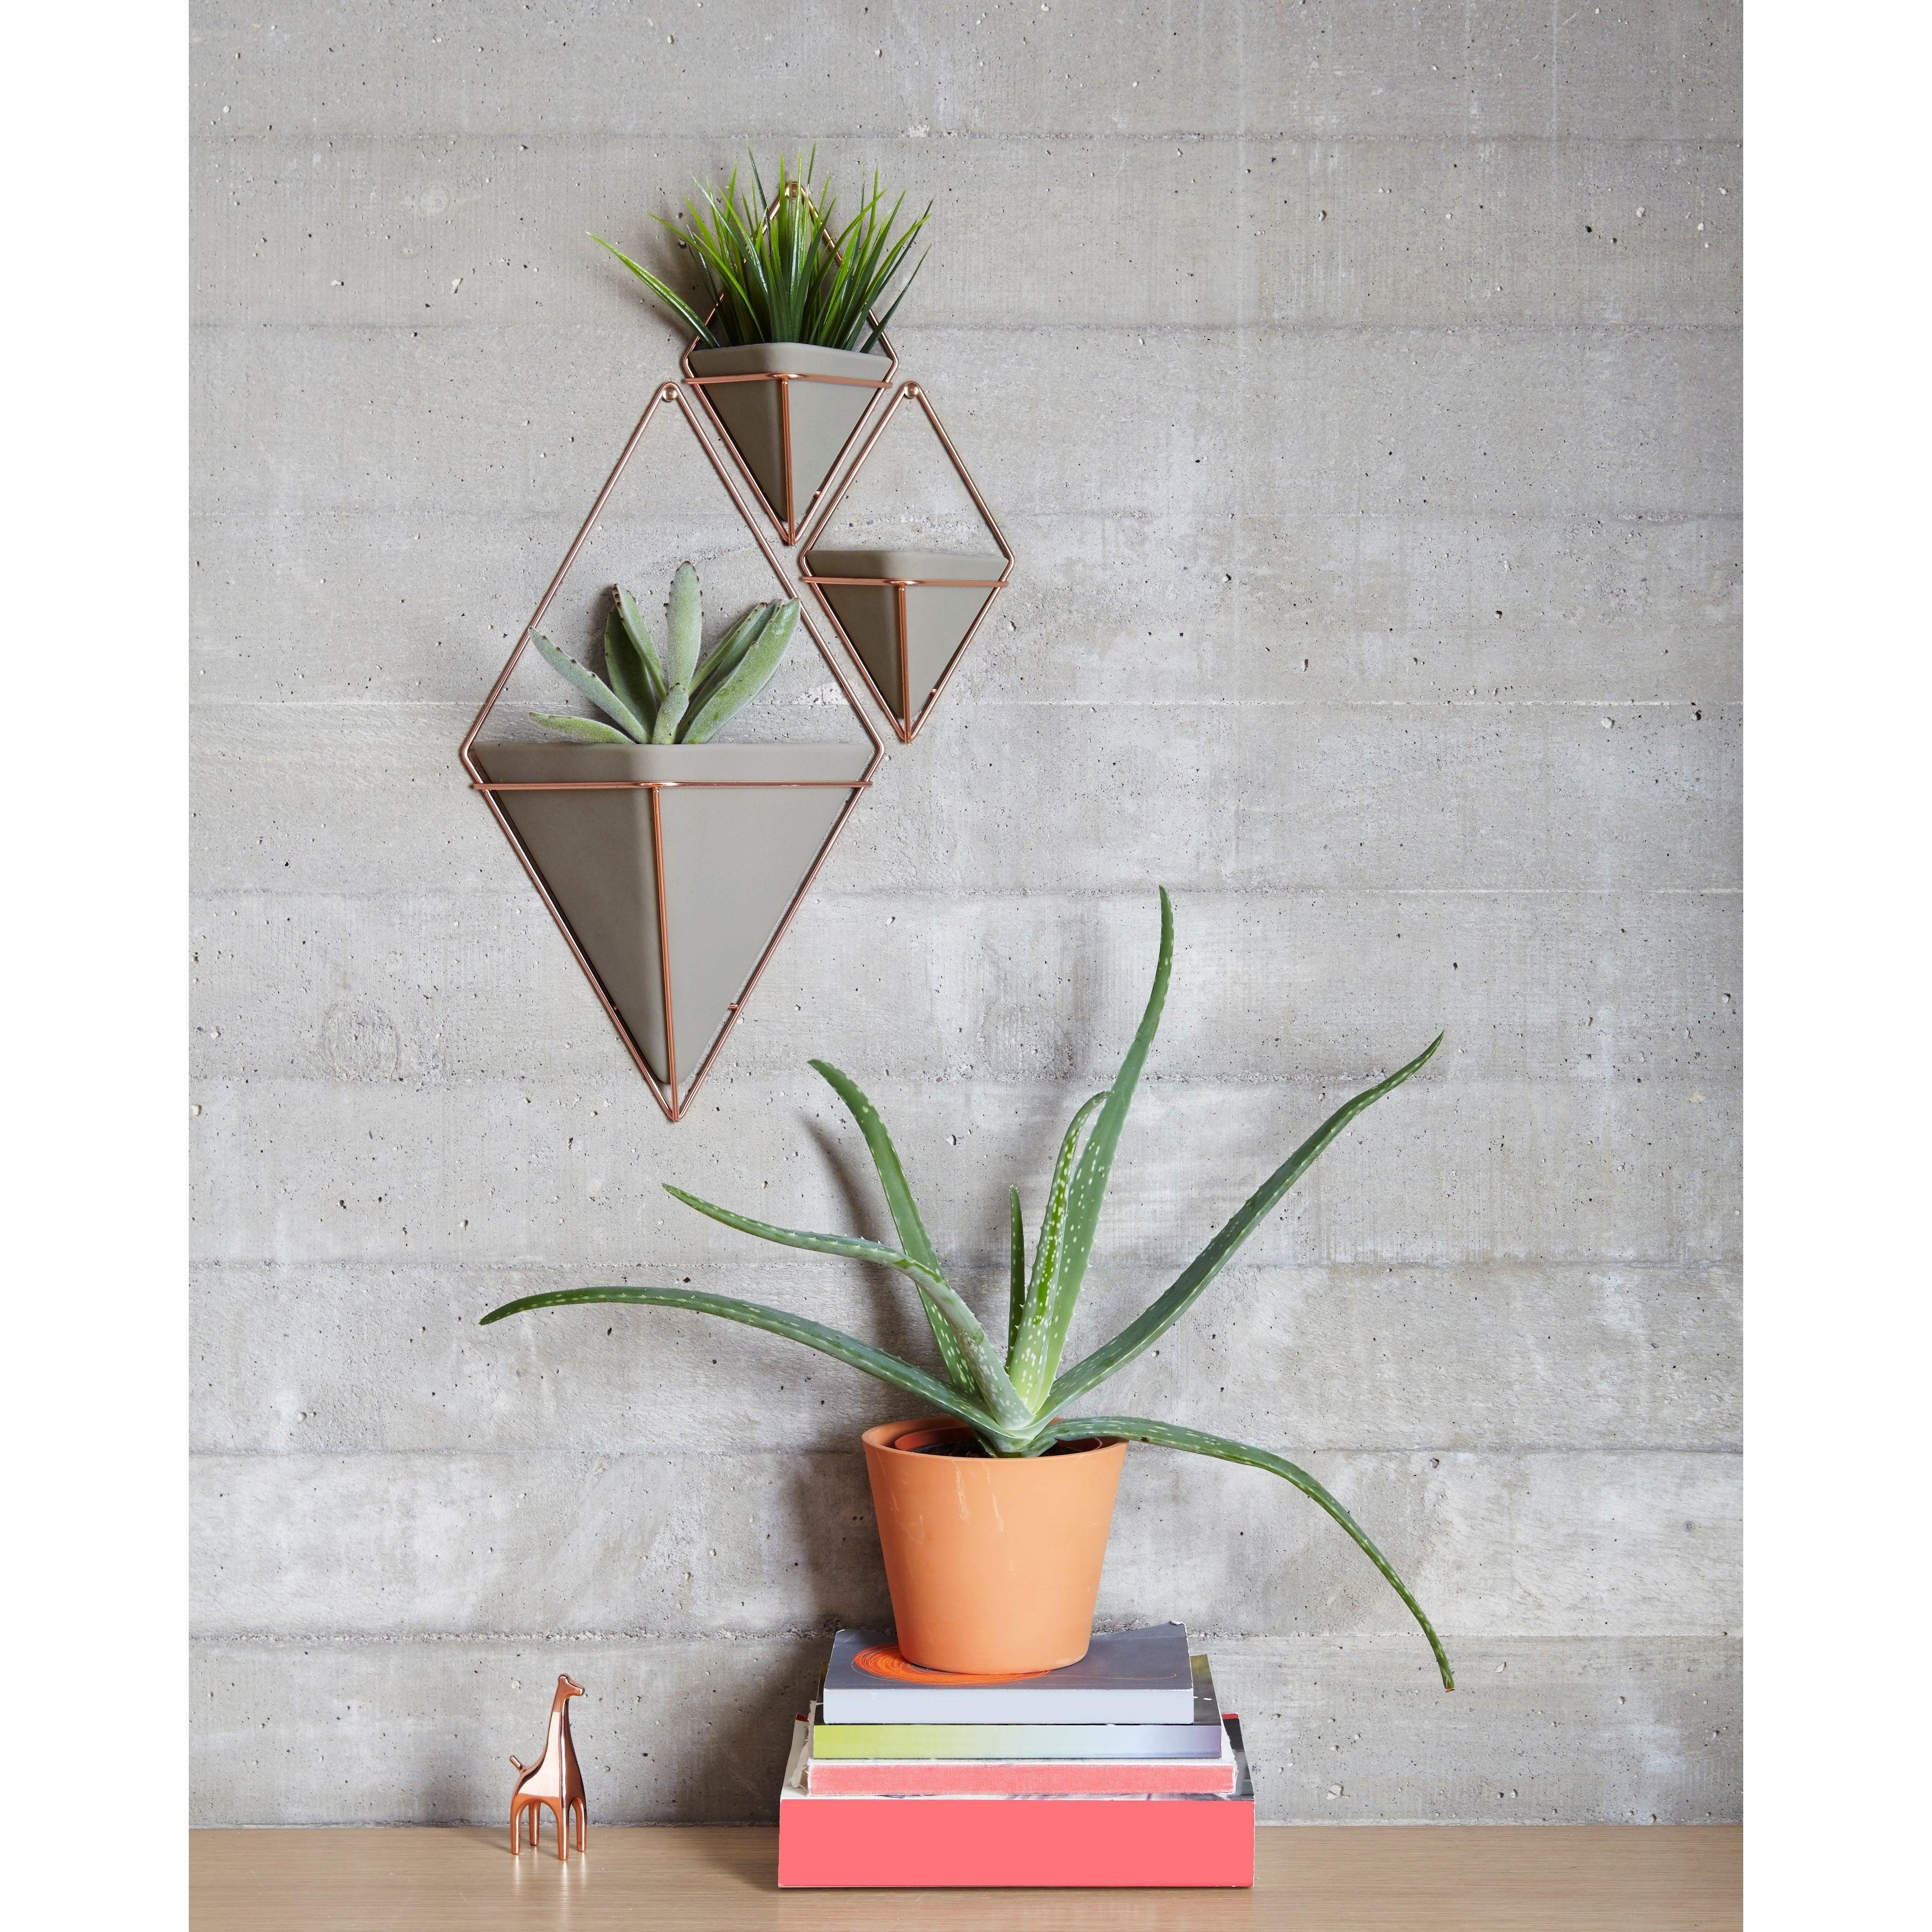 Trigg Ceramic Planter Wall Decor With Regard To Most Popular Shop Umbra Trigg Hanging Planter & Wall Decor (set Of 2) – Free (View 5 of 20)